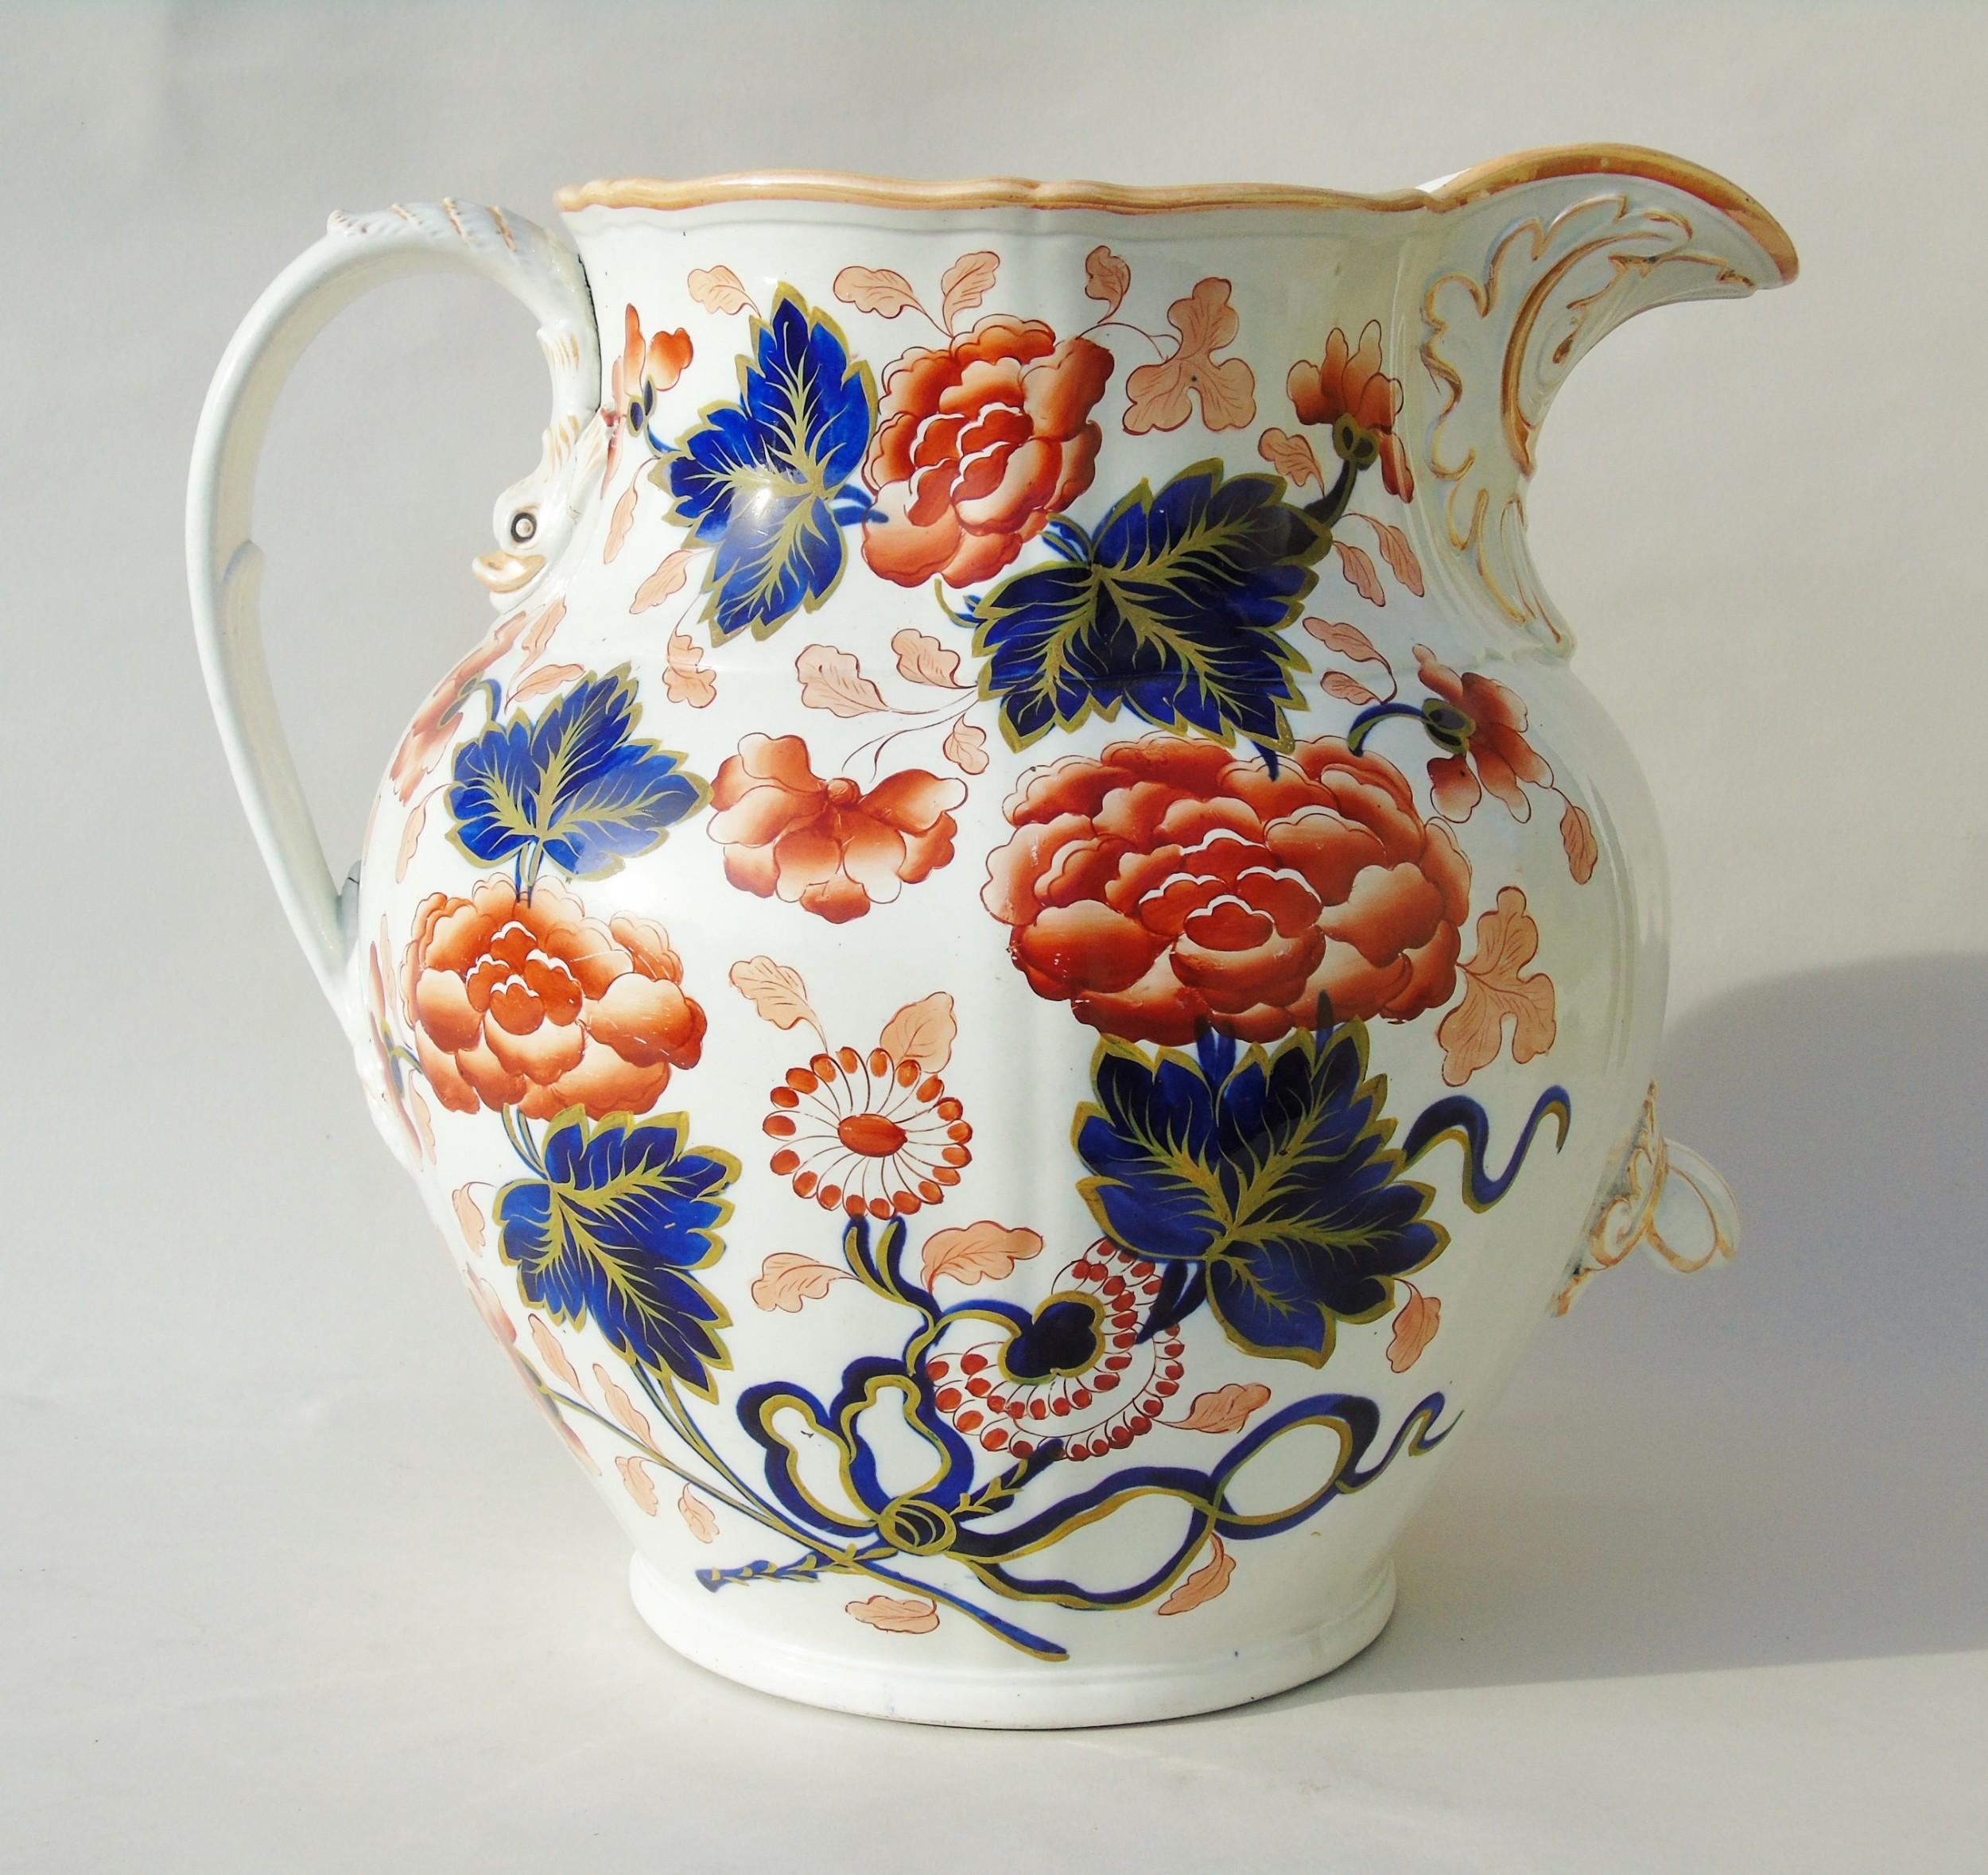 antique very large staffordshire stone china jug